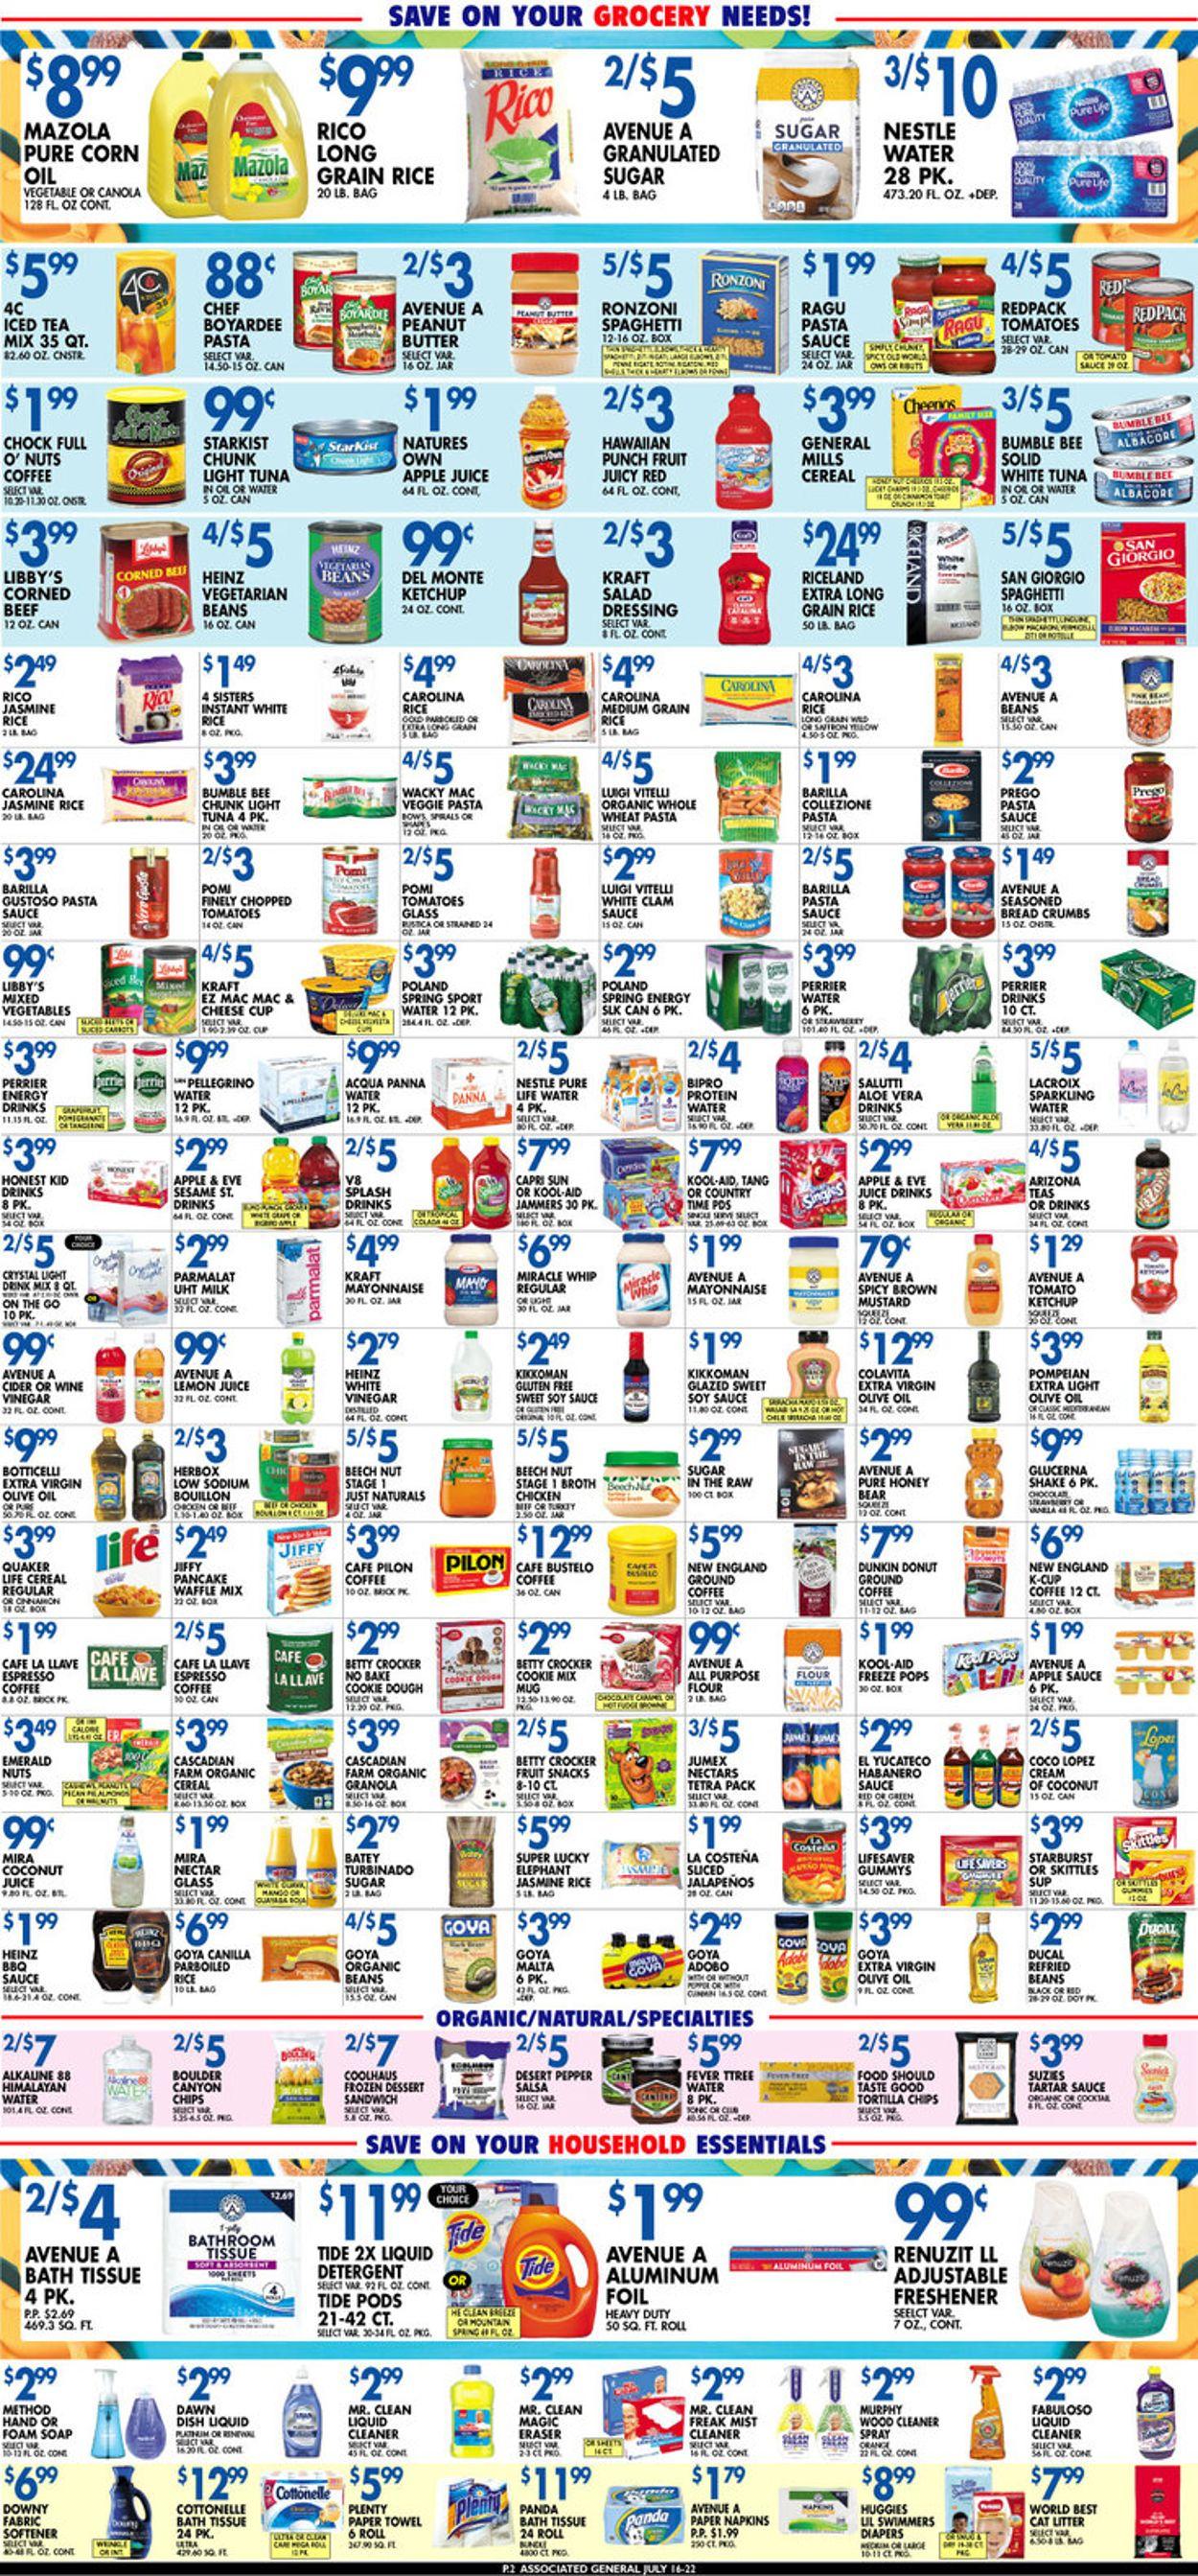 Associated Supermarkets Weekly Ad Circular - valid 07/16-07/22/2021 (Page 2)